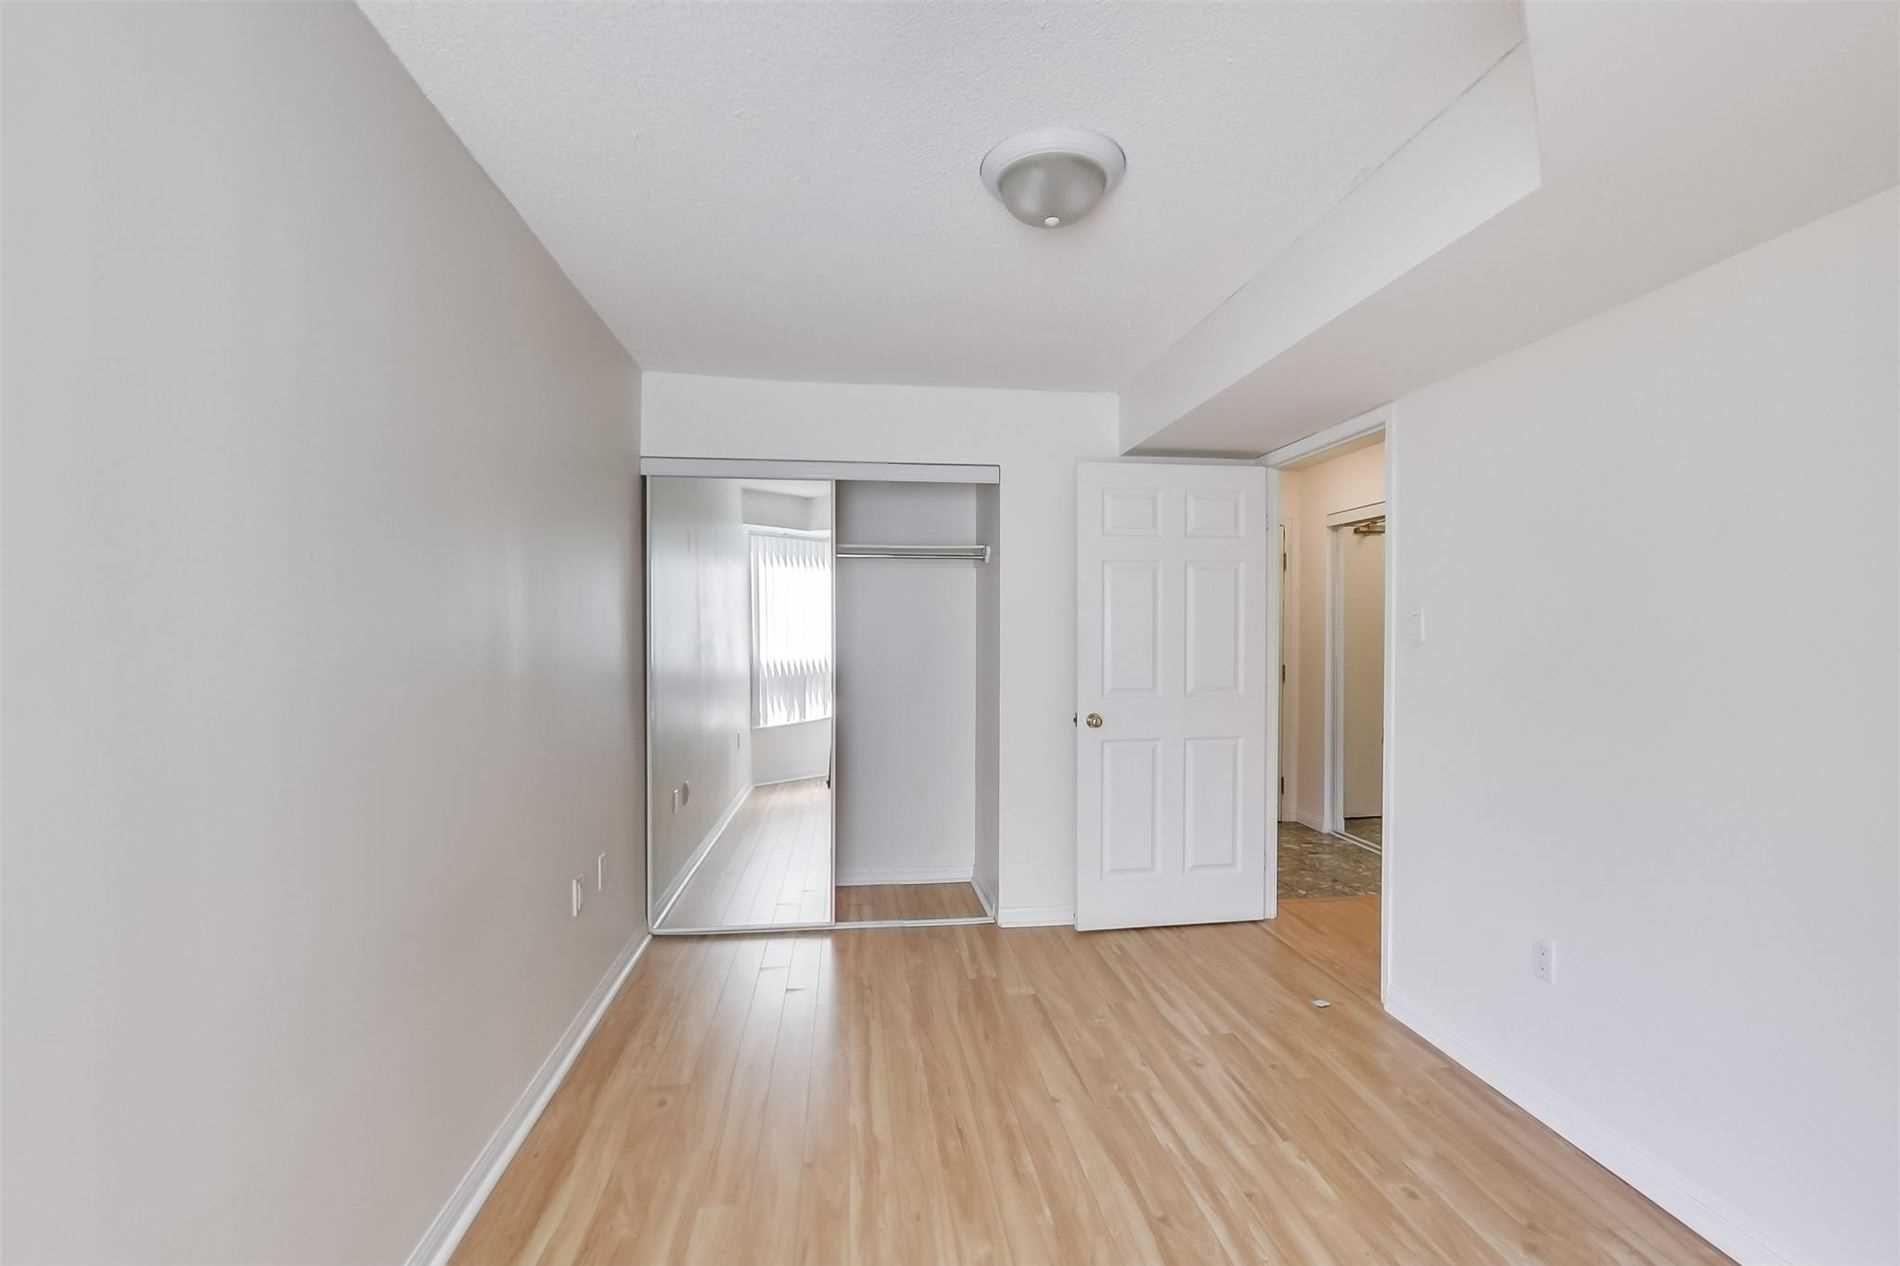 Photo 13: Photos: 808 109 E Front Street in Toronto: Moss Park Condo for lease (Toronto C08)  : MLS®# C4816382